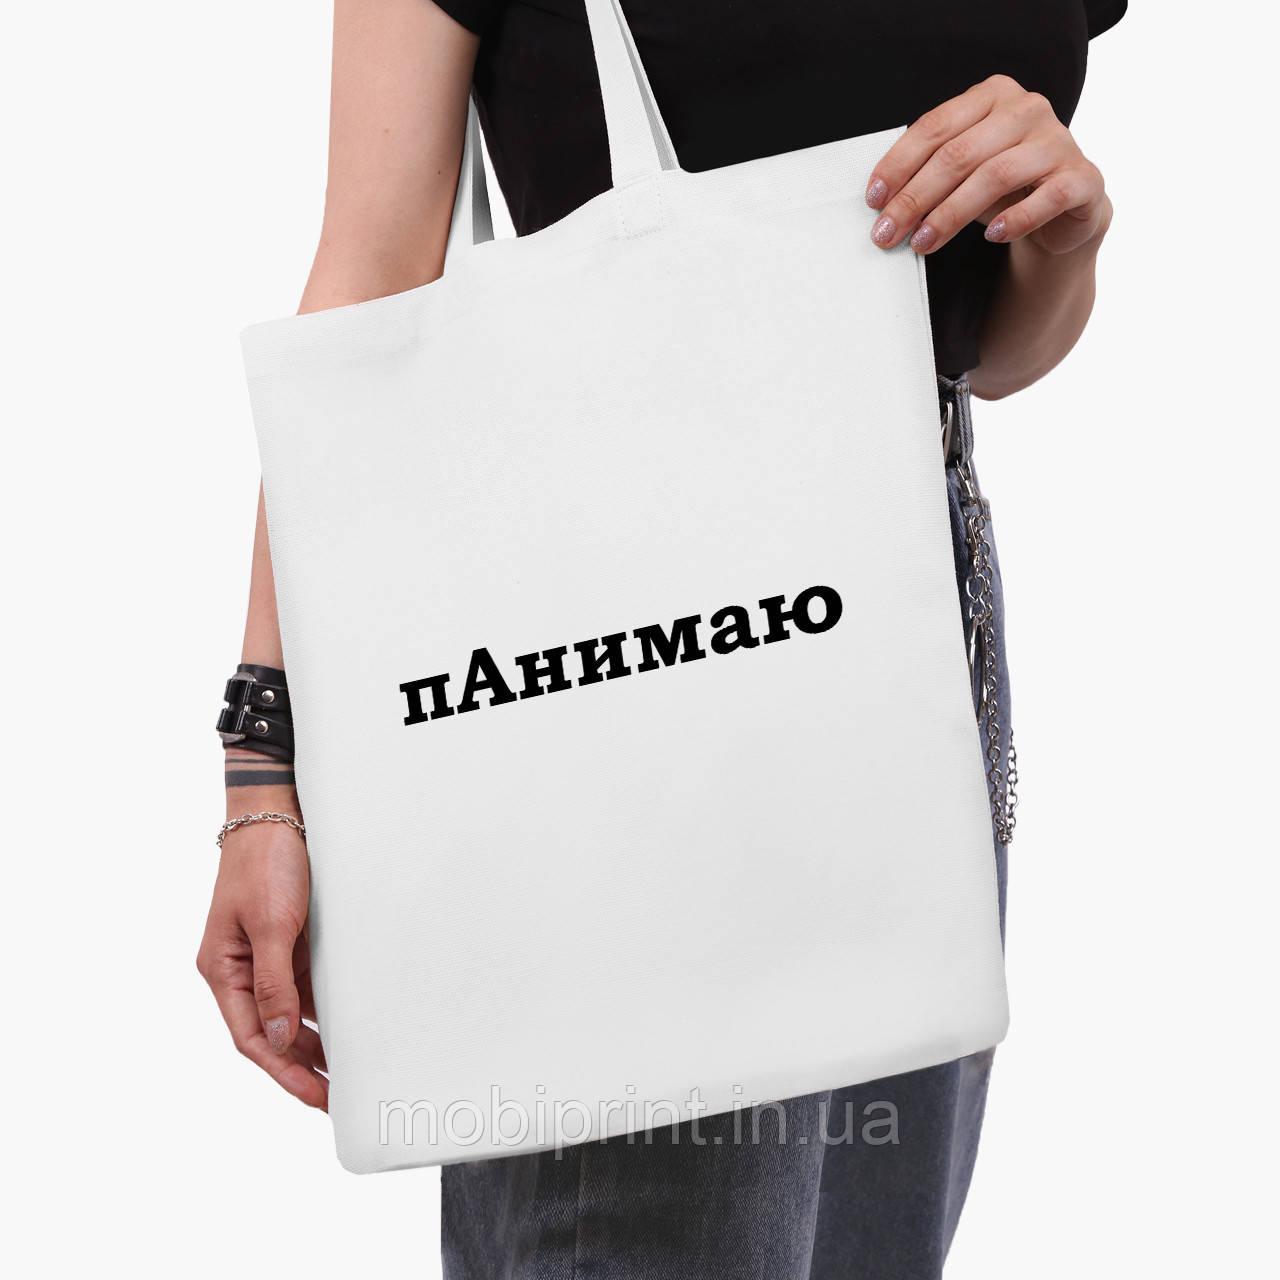 Еко сумка шоппер біла пАнимаю (9227-1282-3) 41*35 см